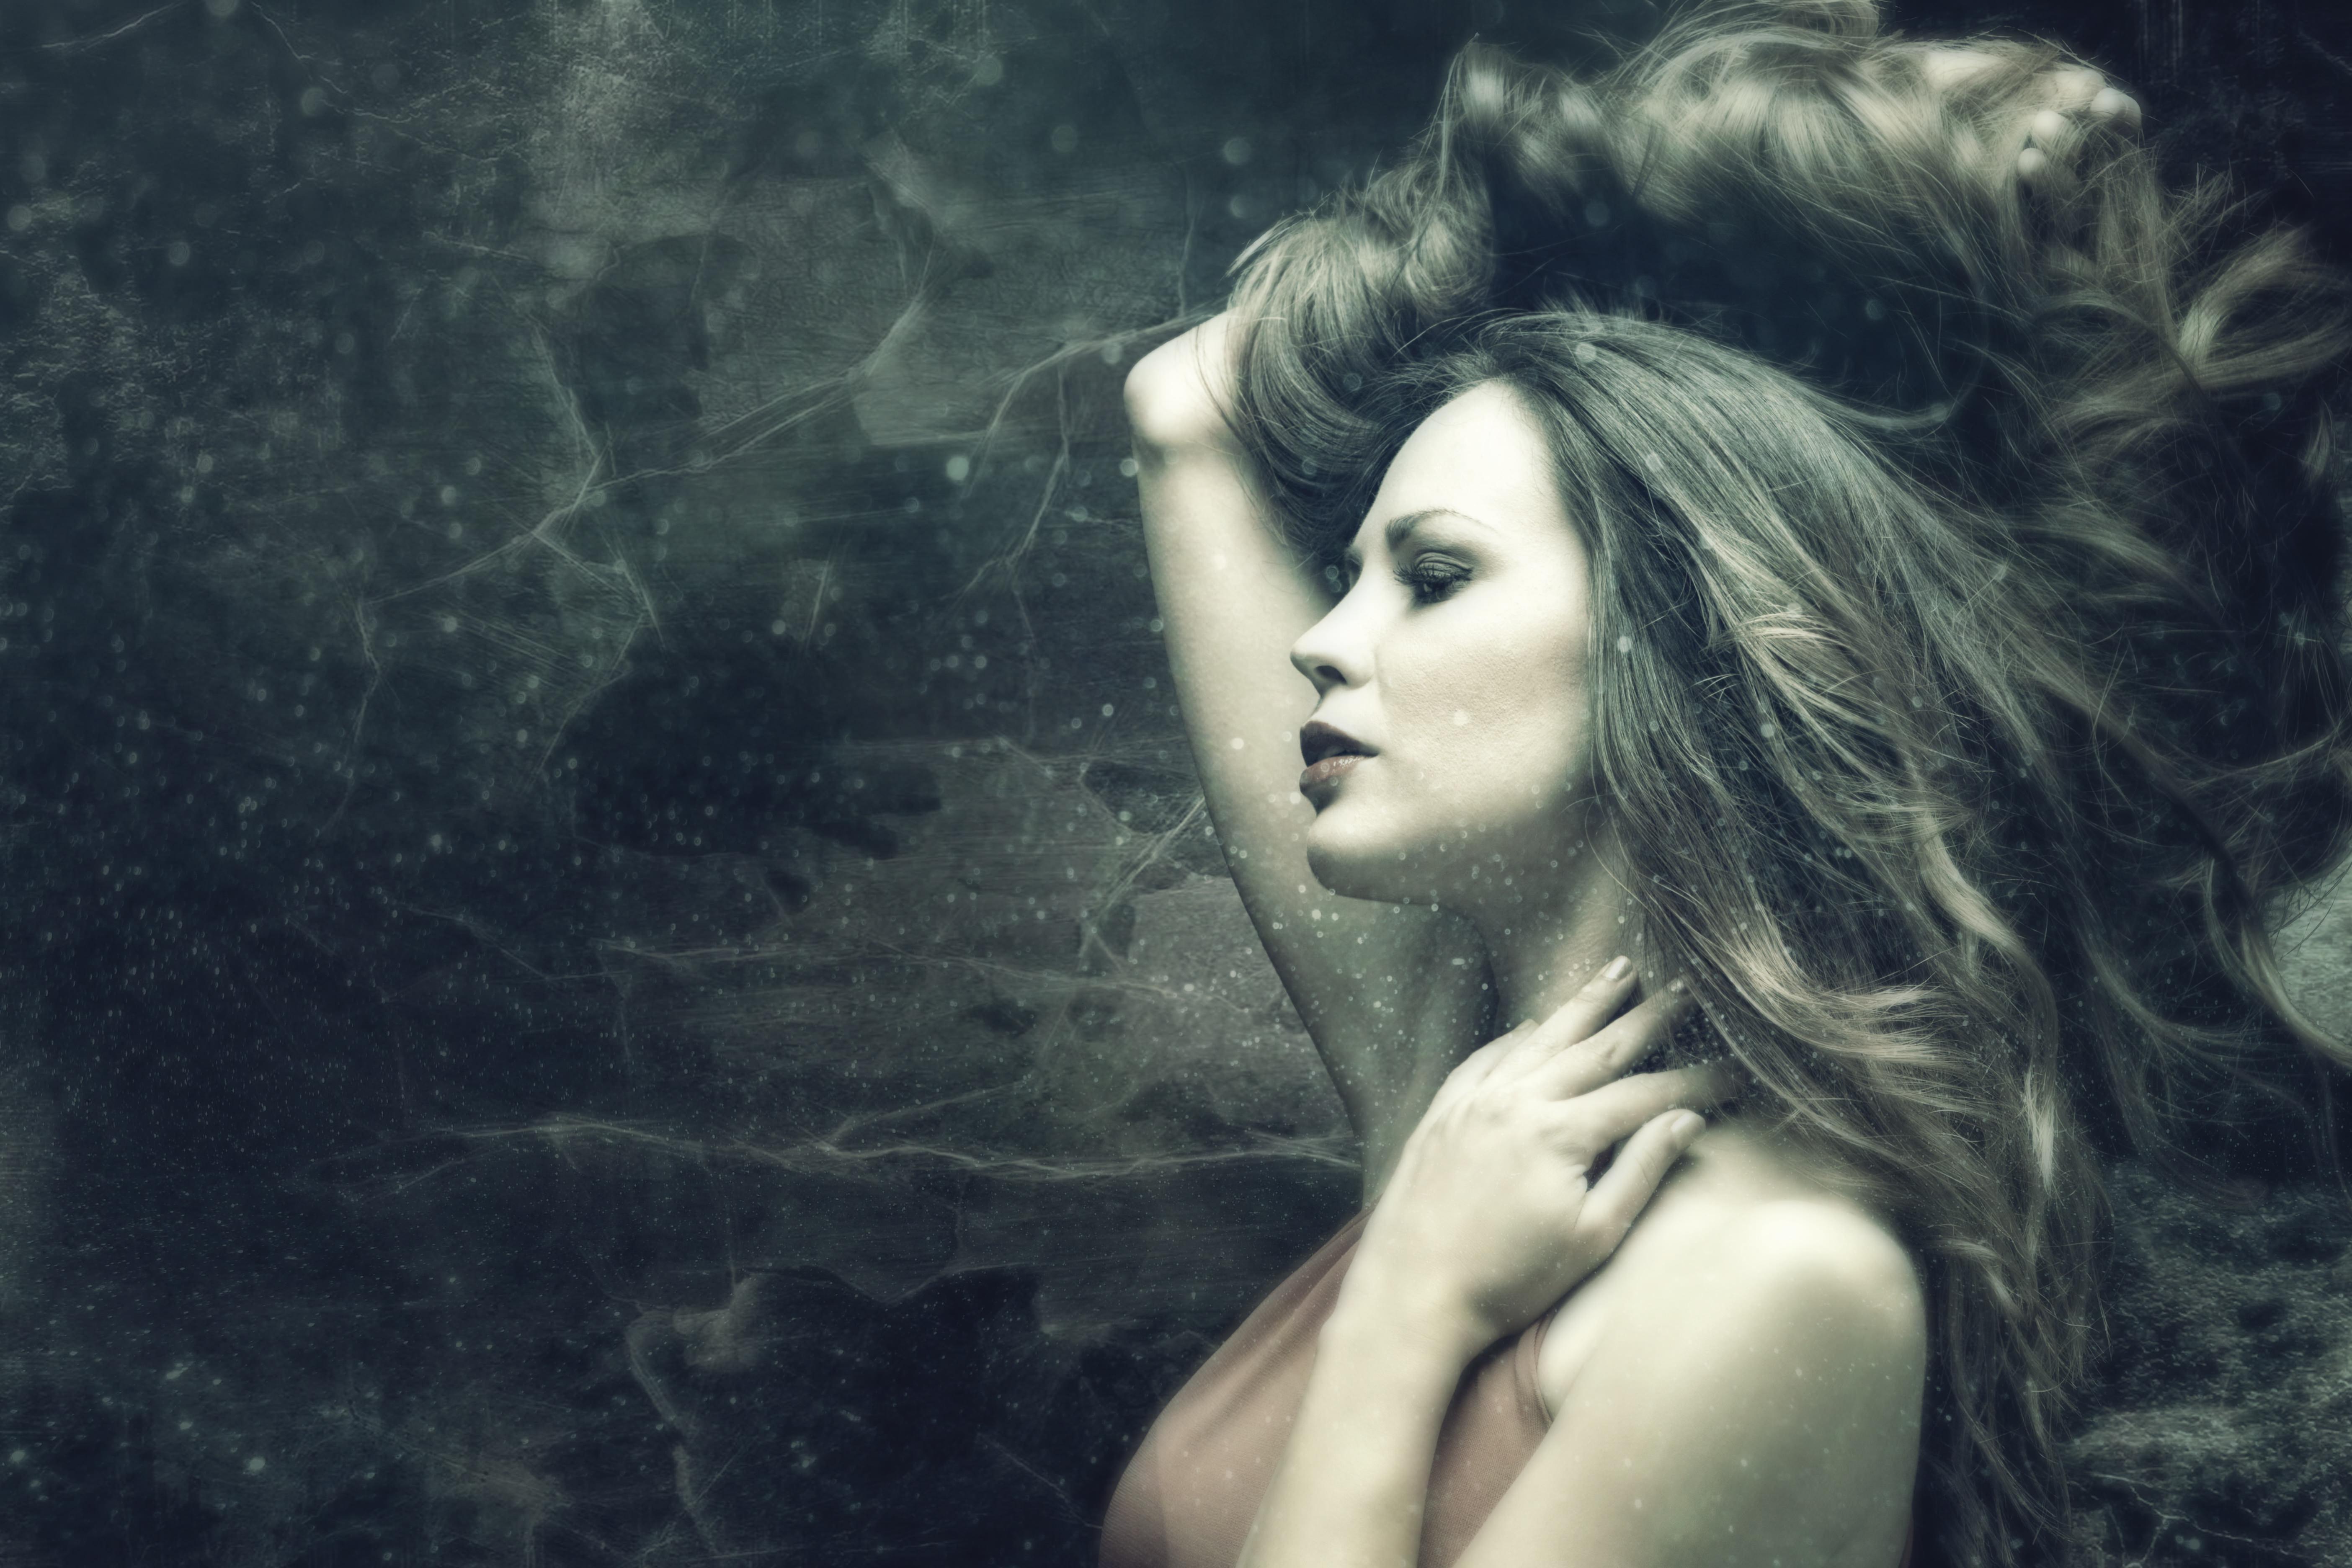 rhea titan goddess of fertility in greek mythological